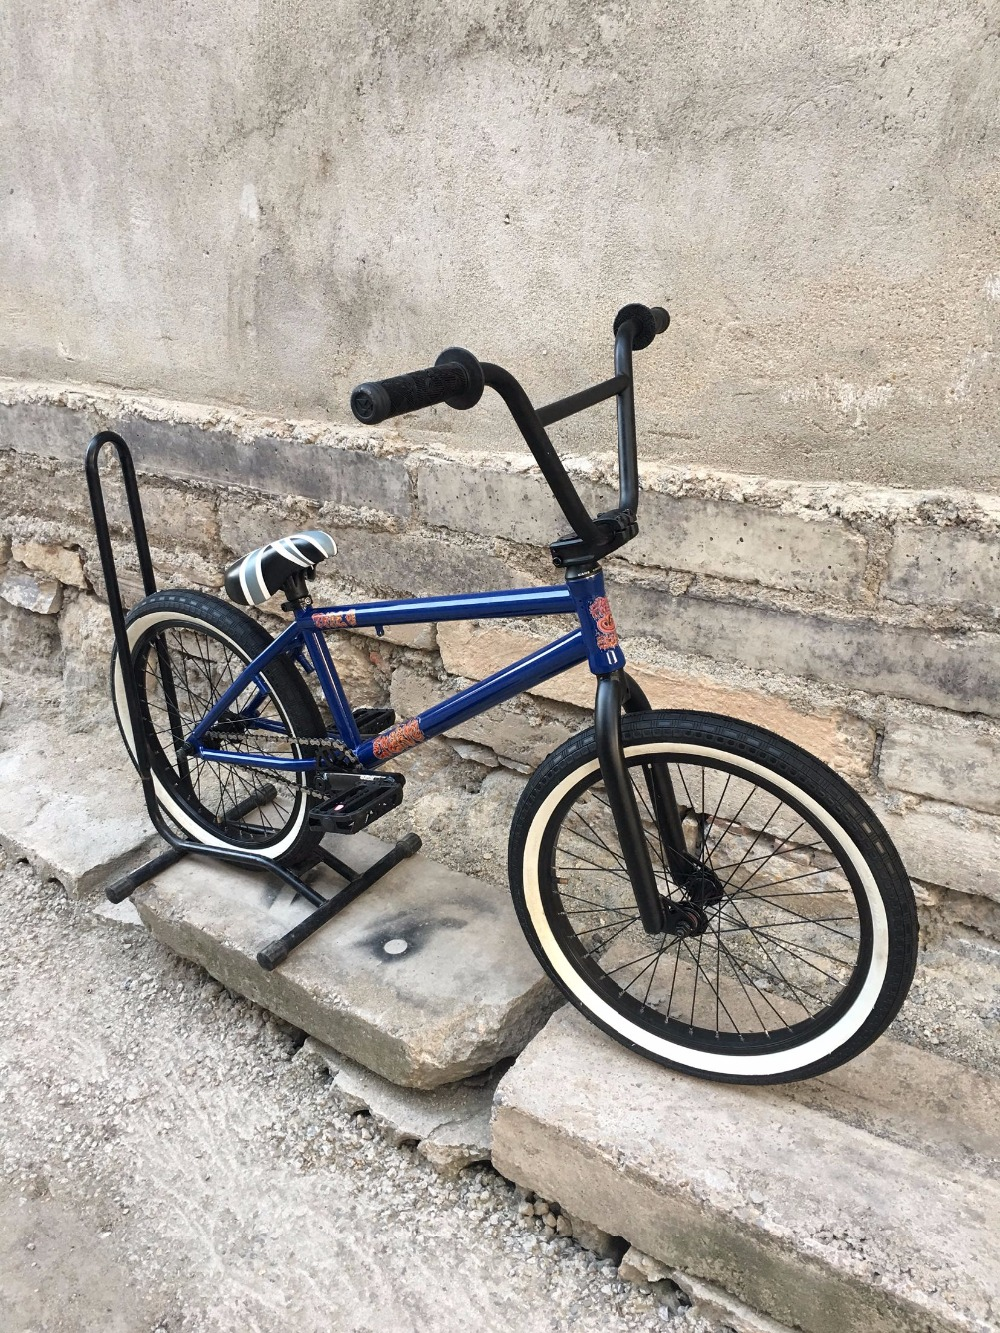 Fiend Type O Diy Bmx Bikes Full CNC Full Bearings